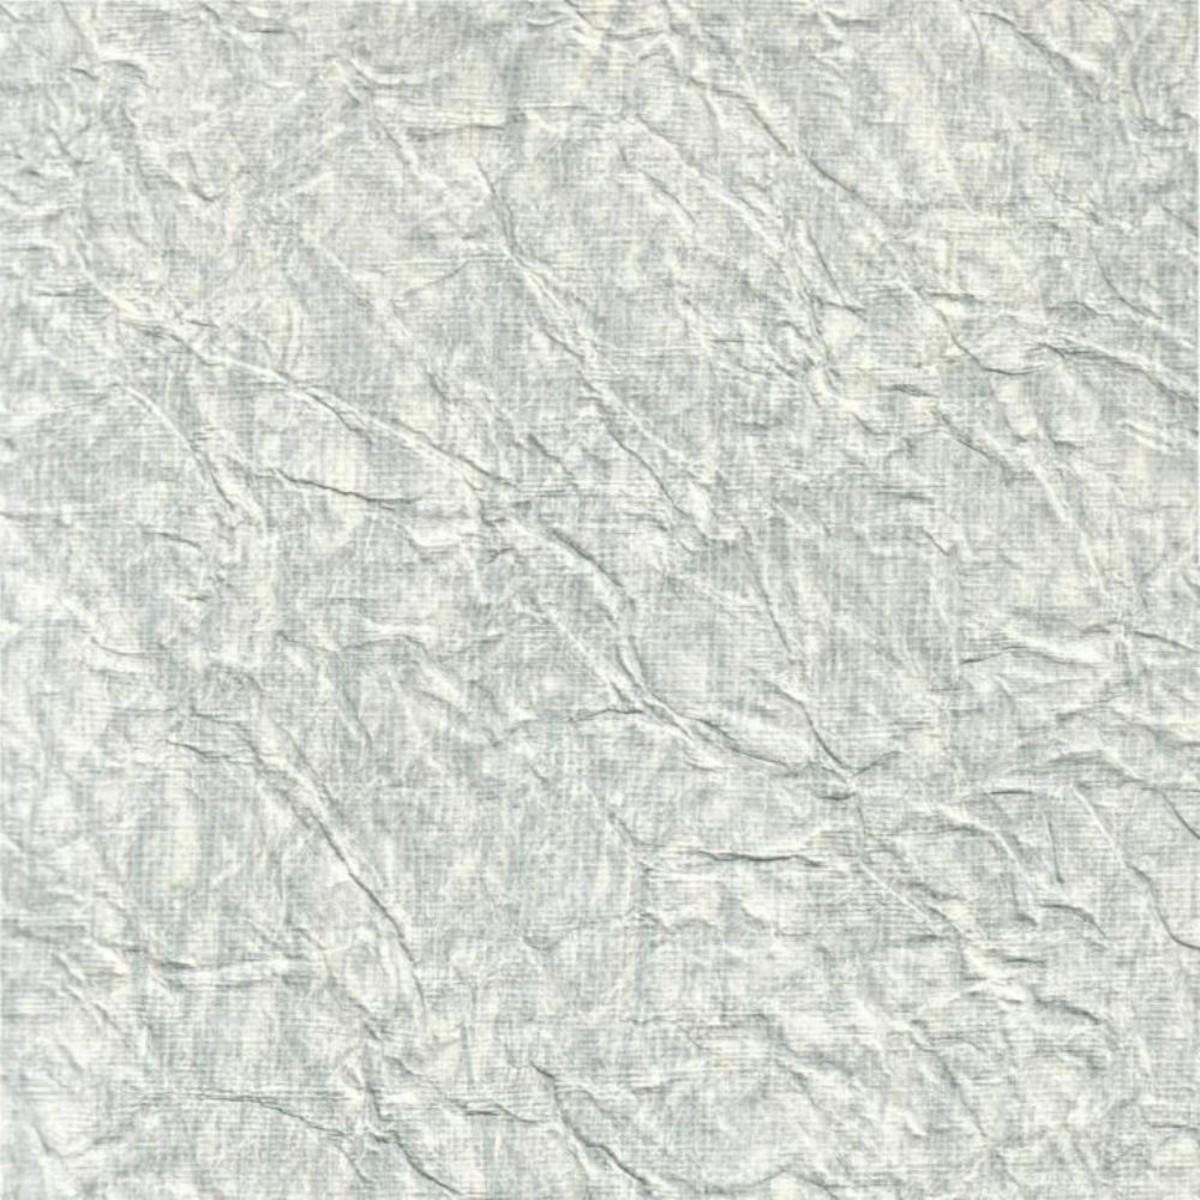 Обои бумажные York Wallcoverings Tonal Resource черные NL1437 0.68 м